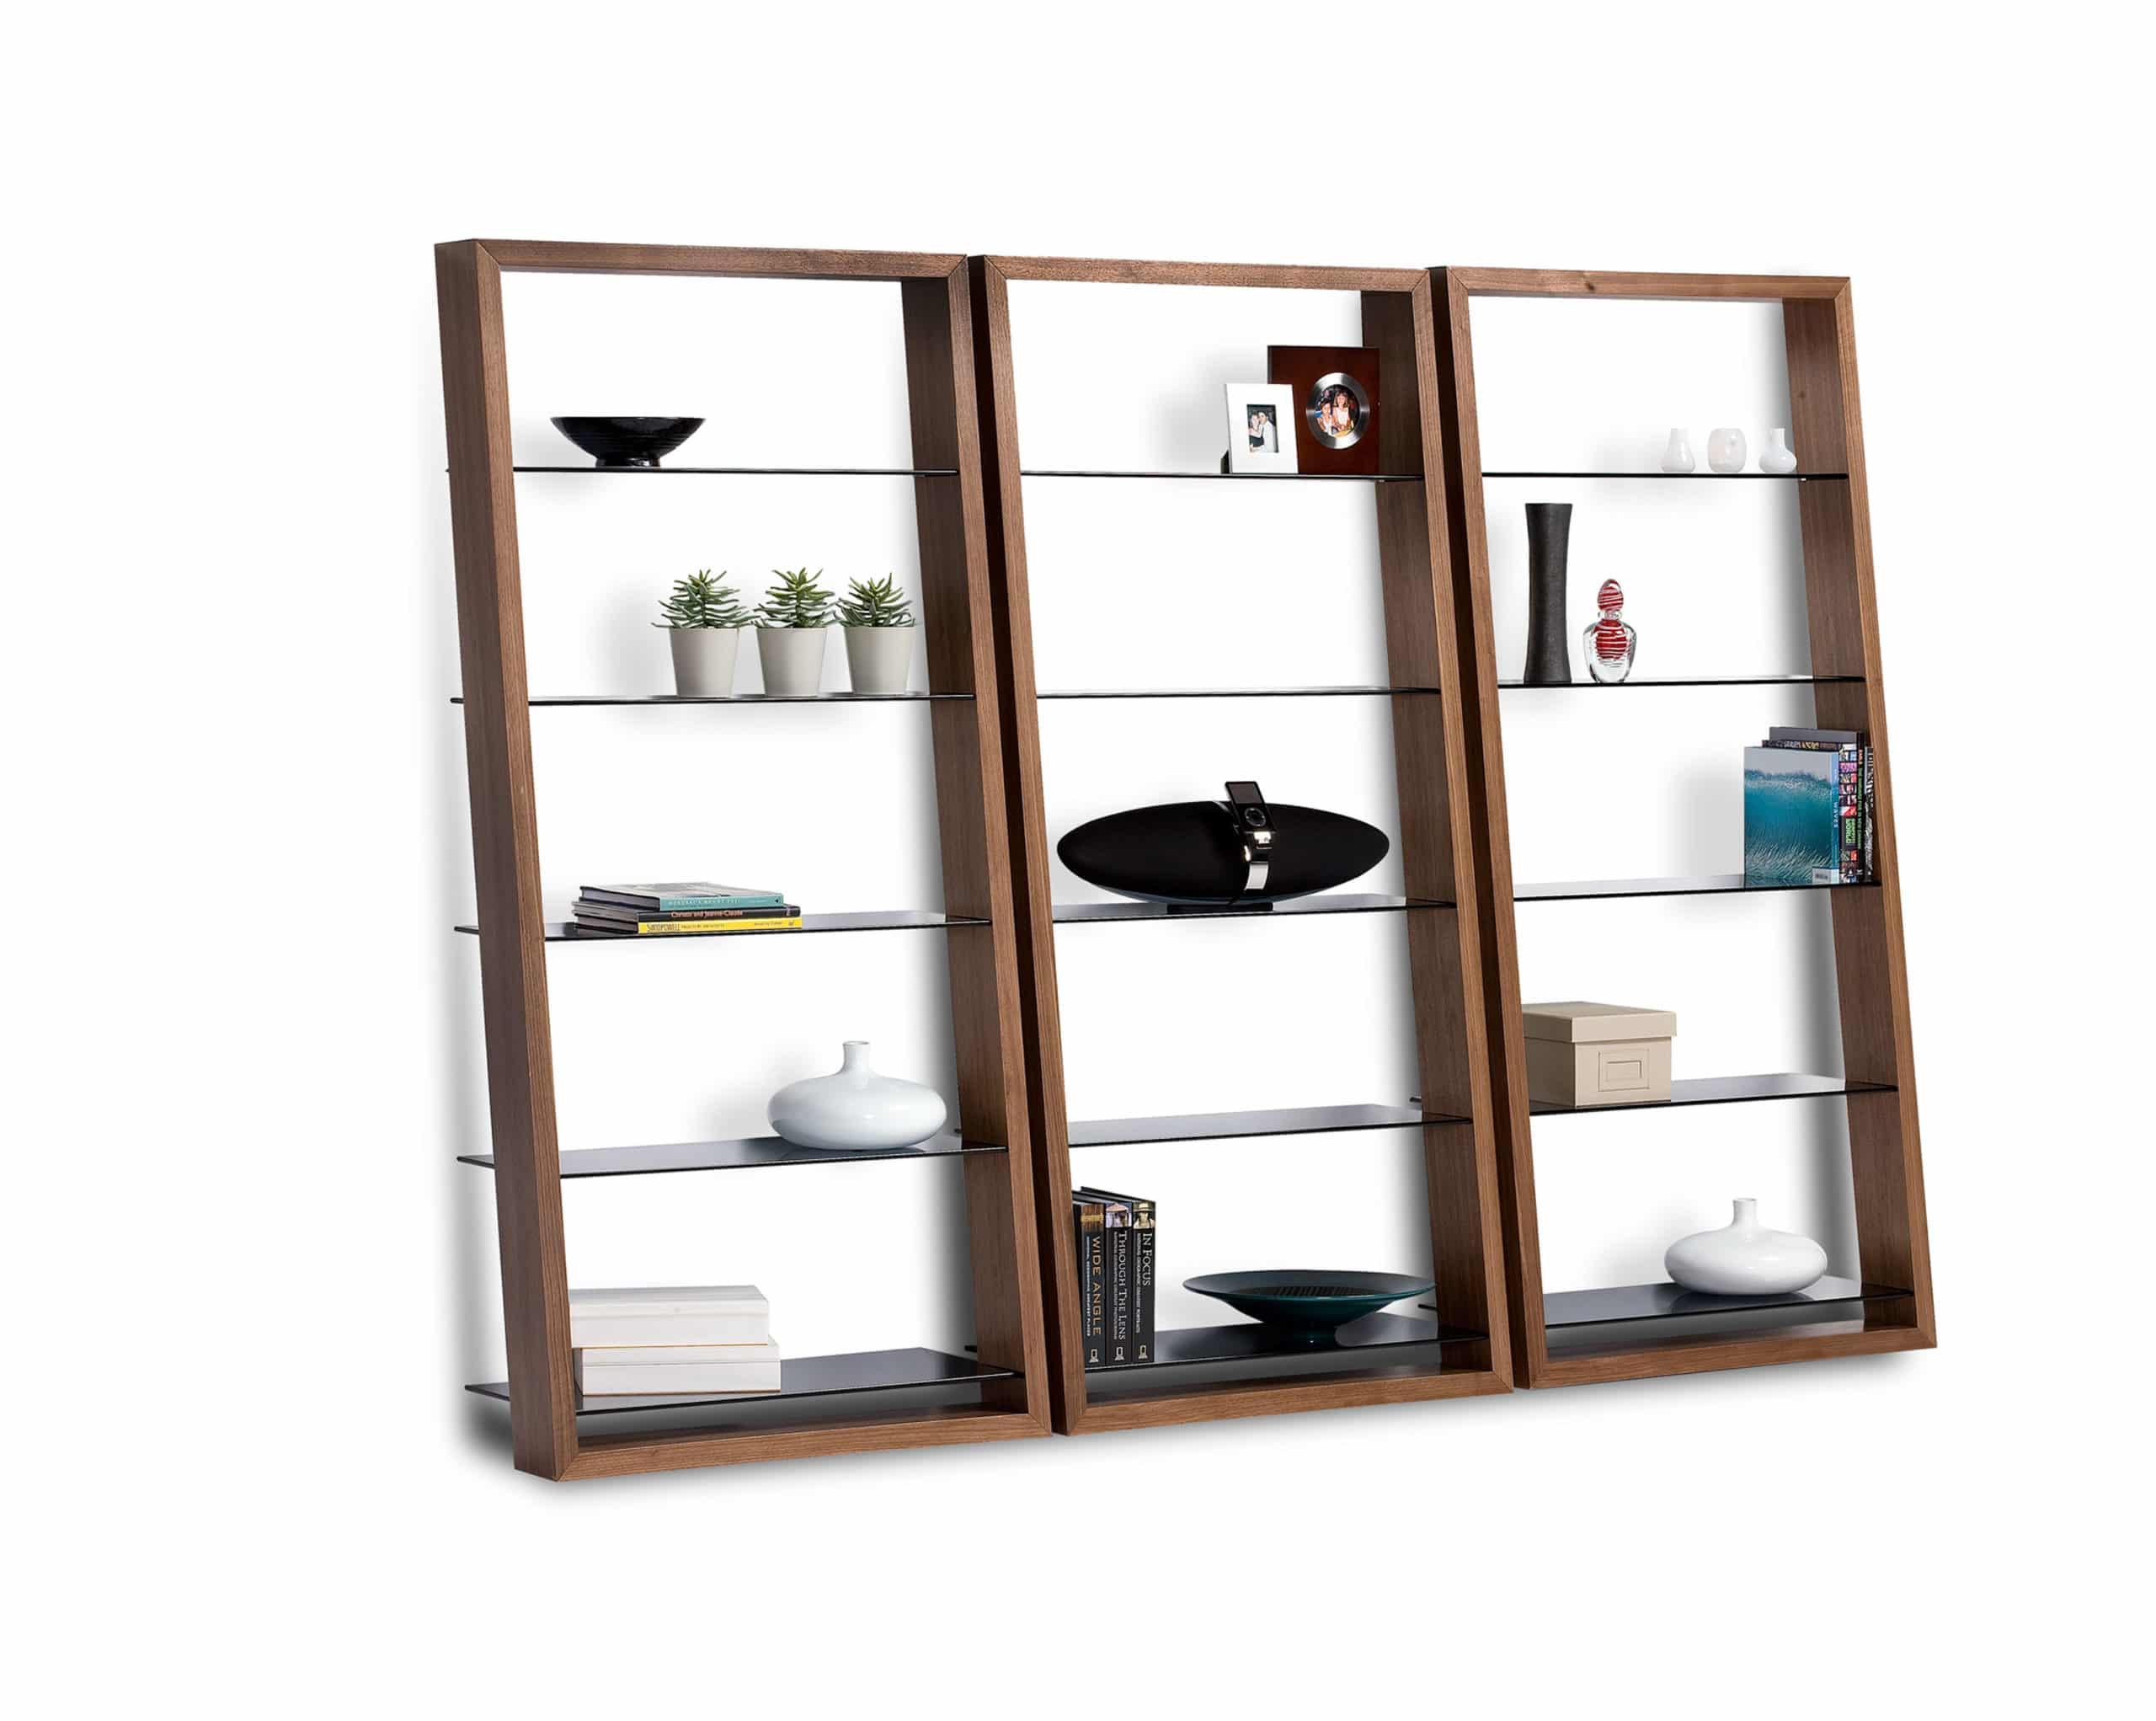 Eileen 5156 Modern Leaning Glass Shelf | BDI Furniture